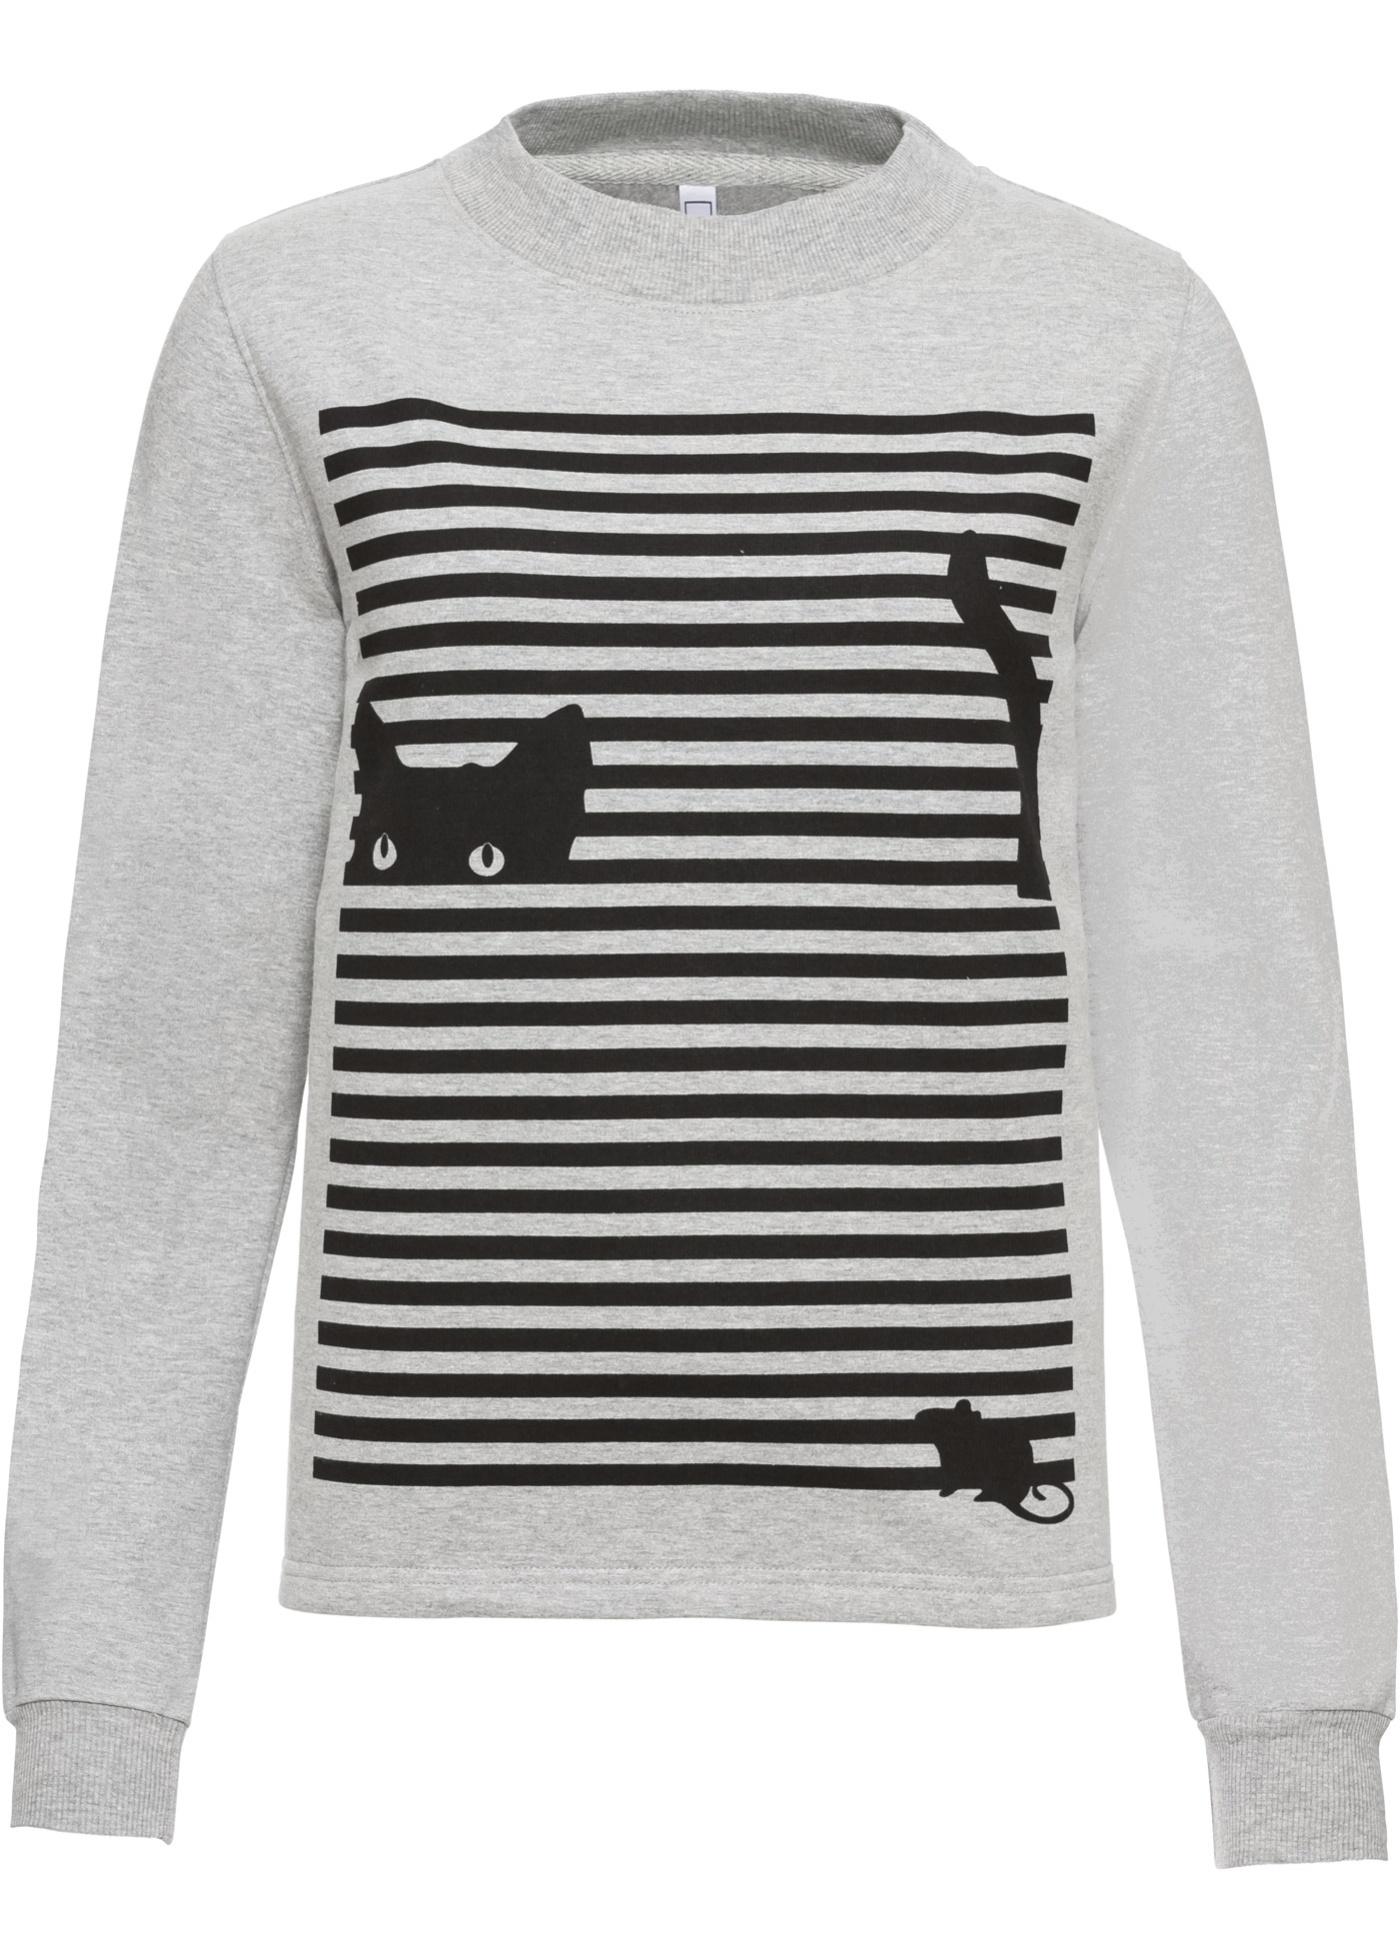 Bonprix SE - Sweatshirt med tryck 139.00